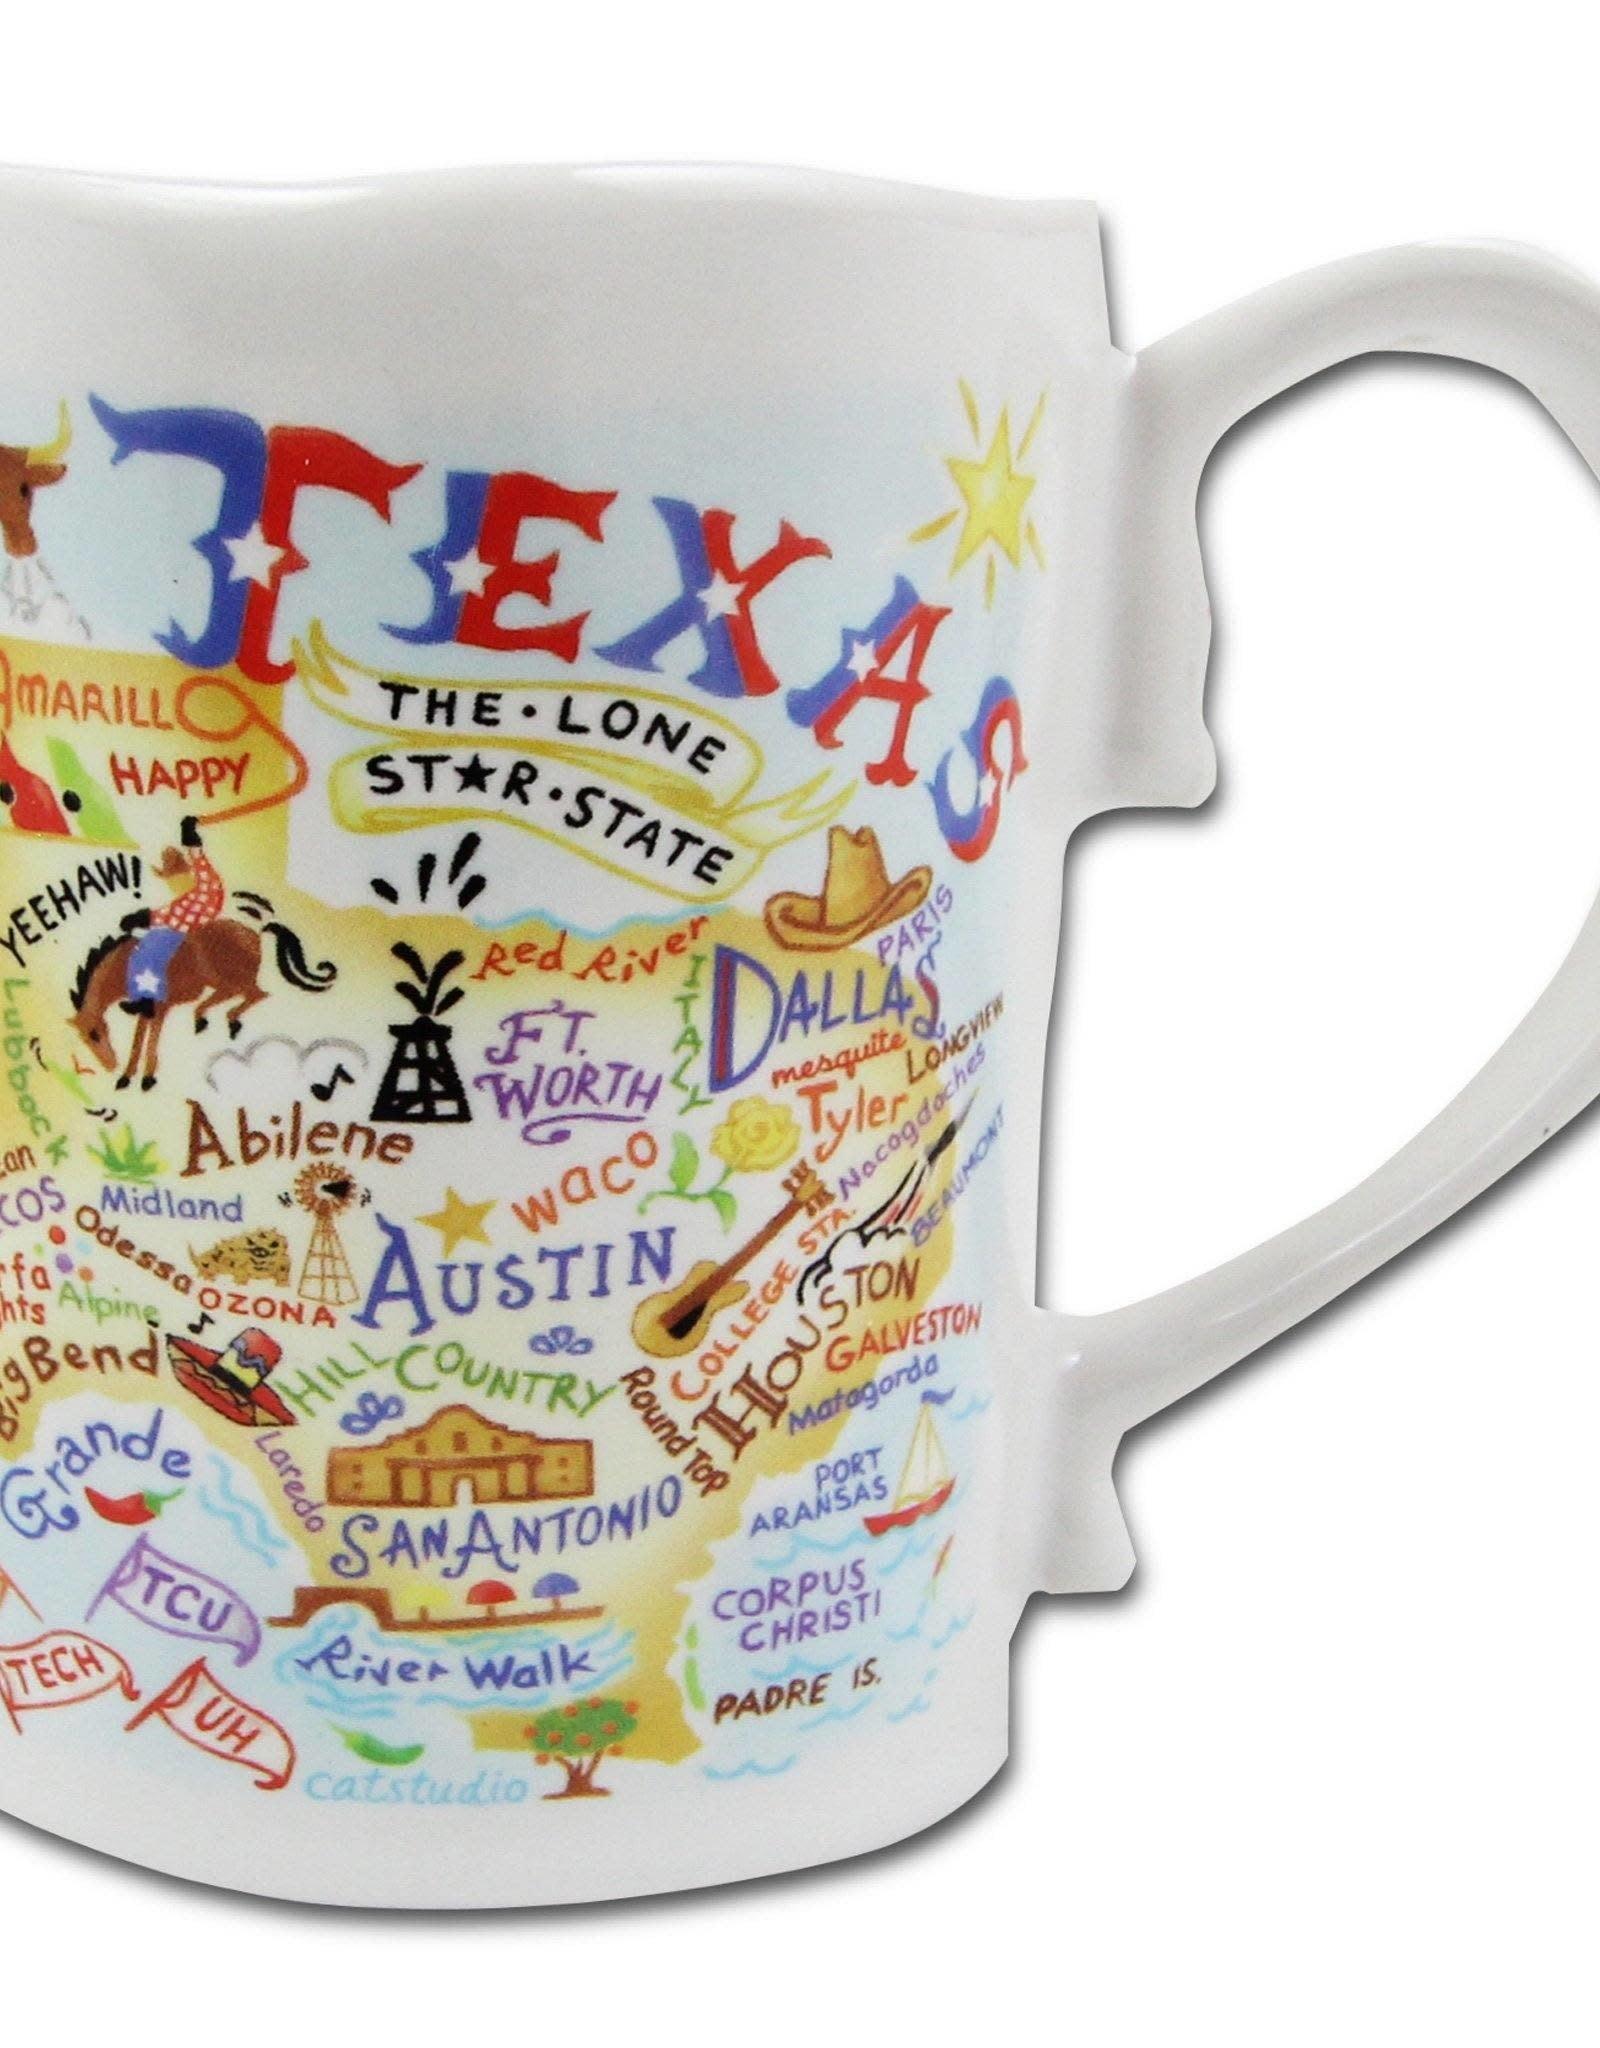 Catstudio Catstudio Texas Mug